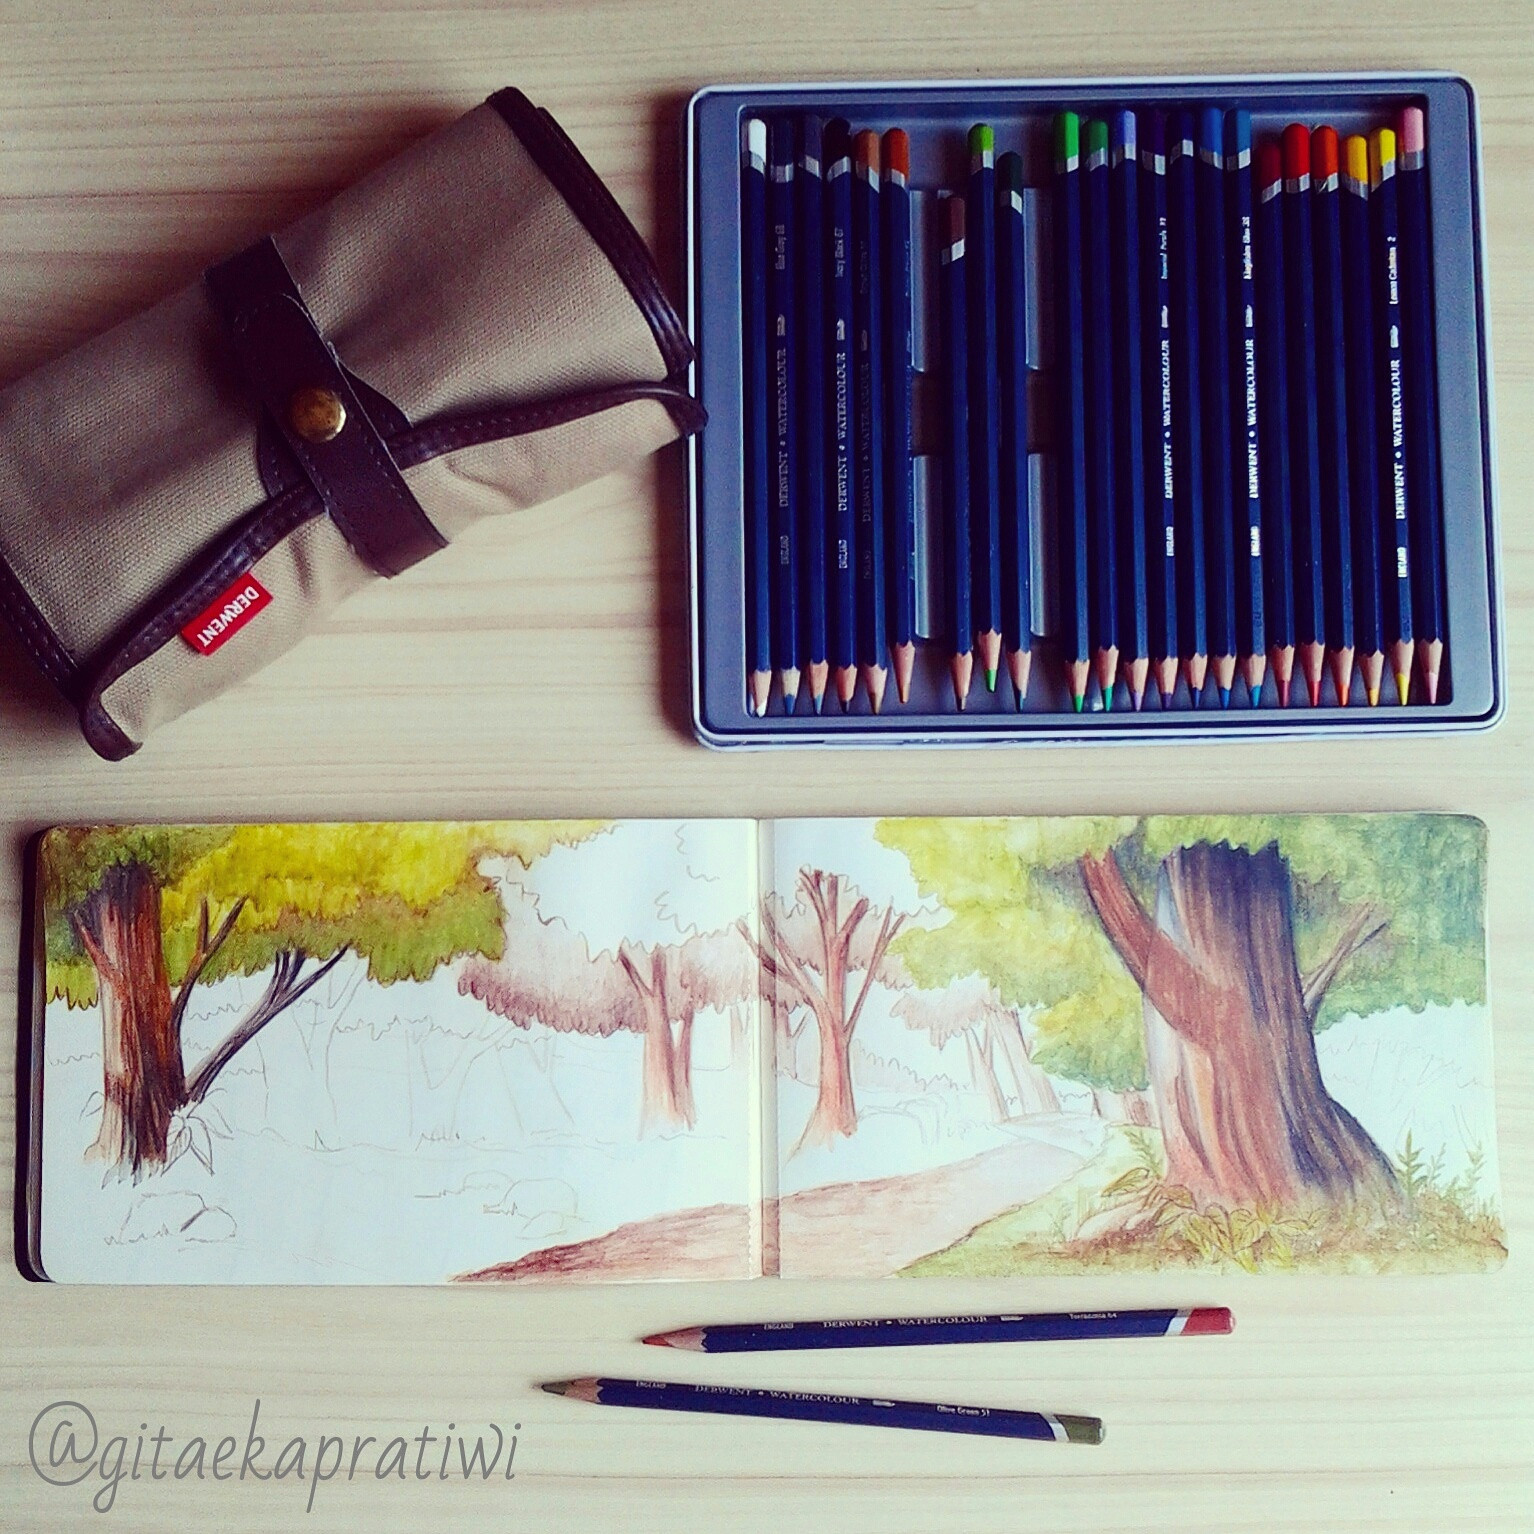 Fairytale Forest – Watercolor Pencils on Moleskine Sketchbook